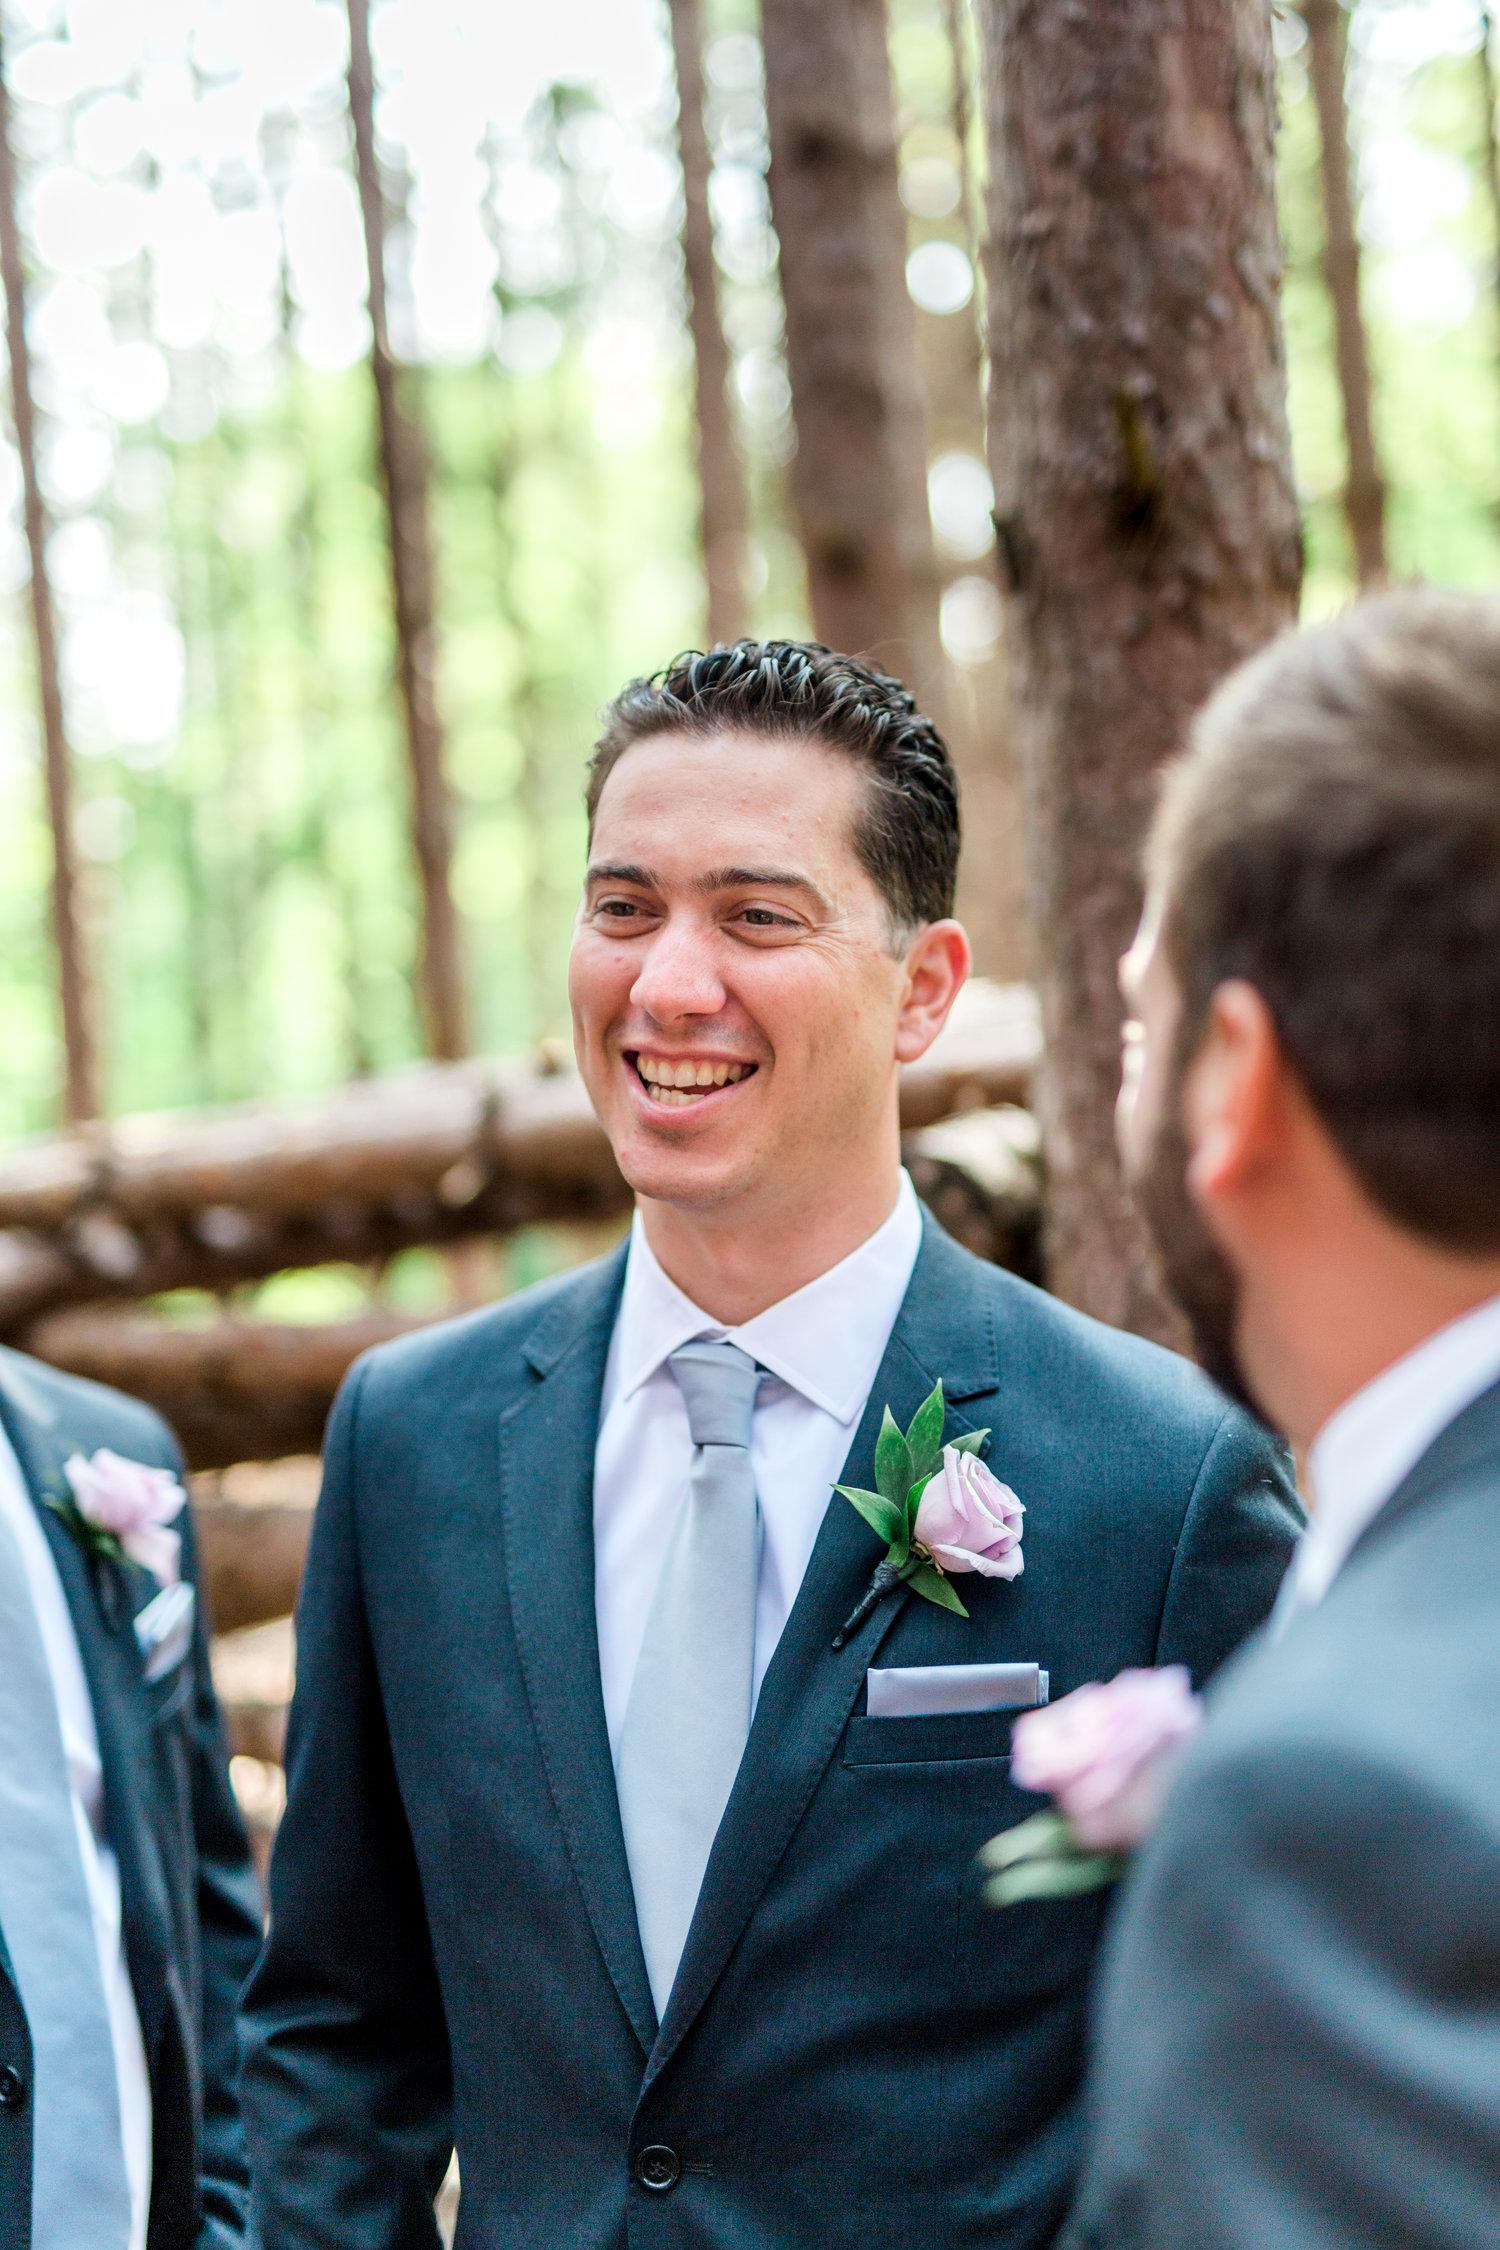 Danielle-Giroux-Amir-Golbazi-Toronto-Wedding-Photographer-Bellvue-Manor_DeLuca_1-618.jpg